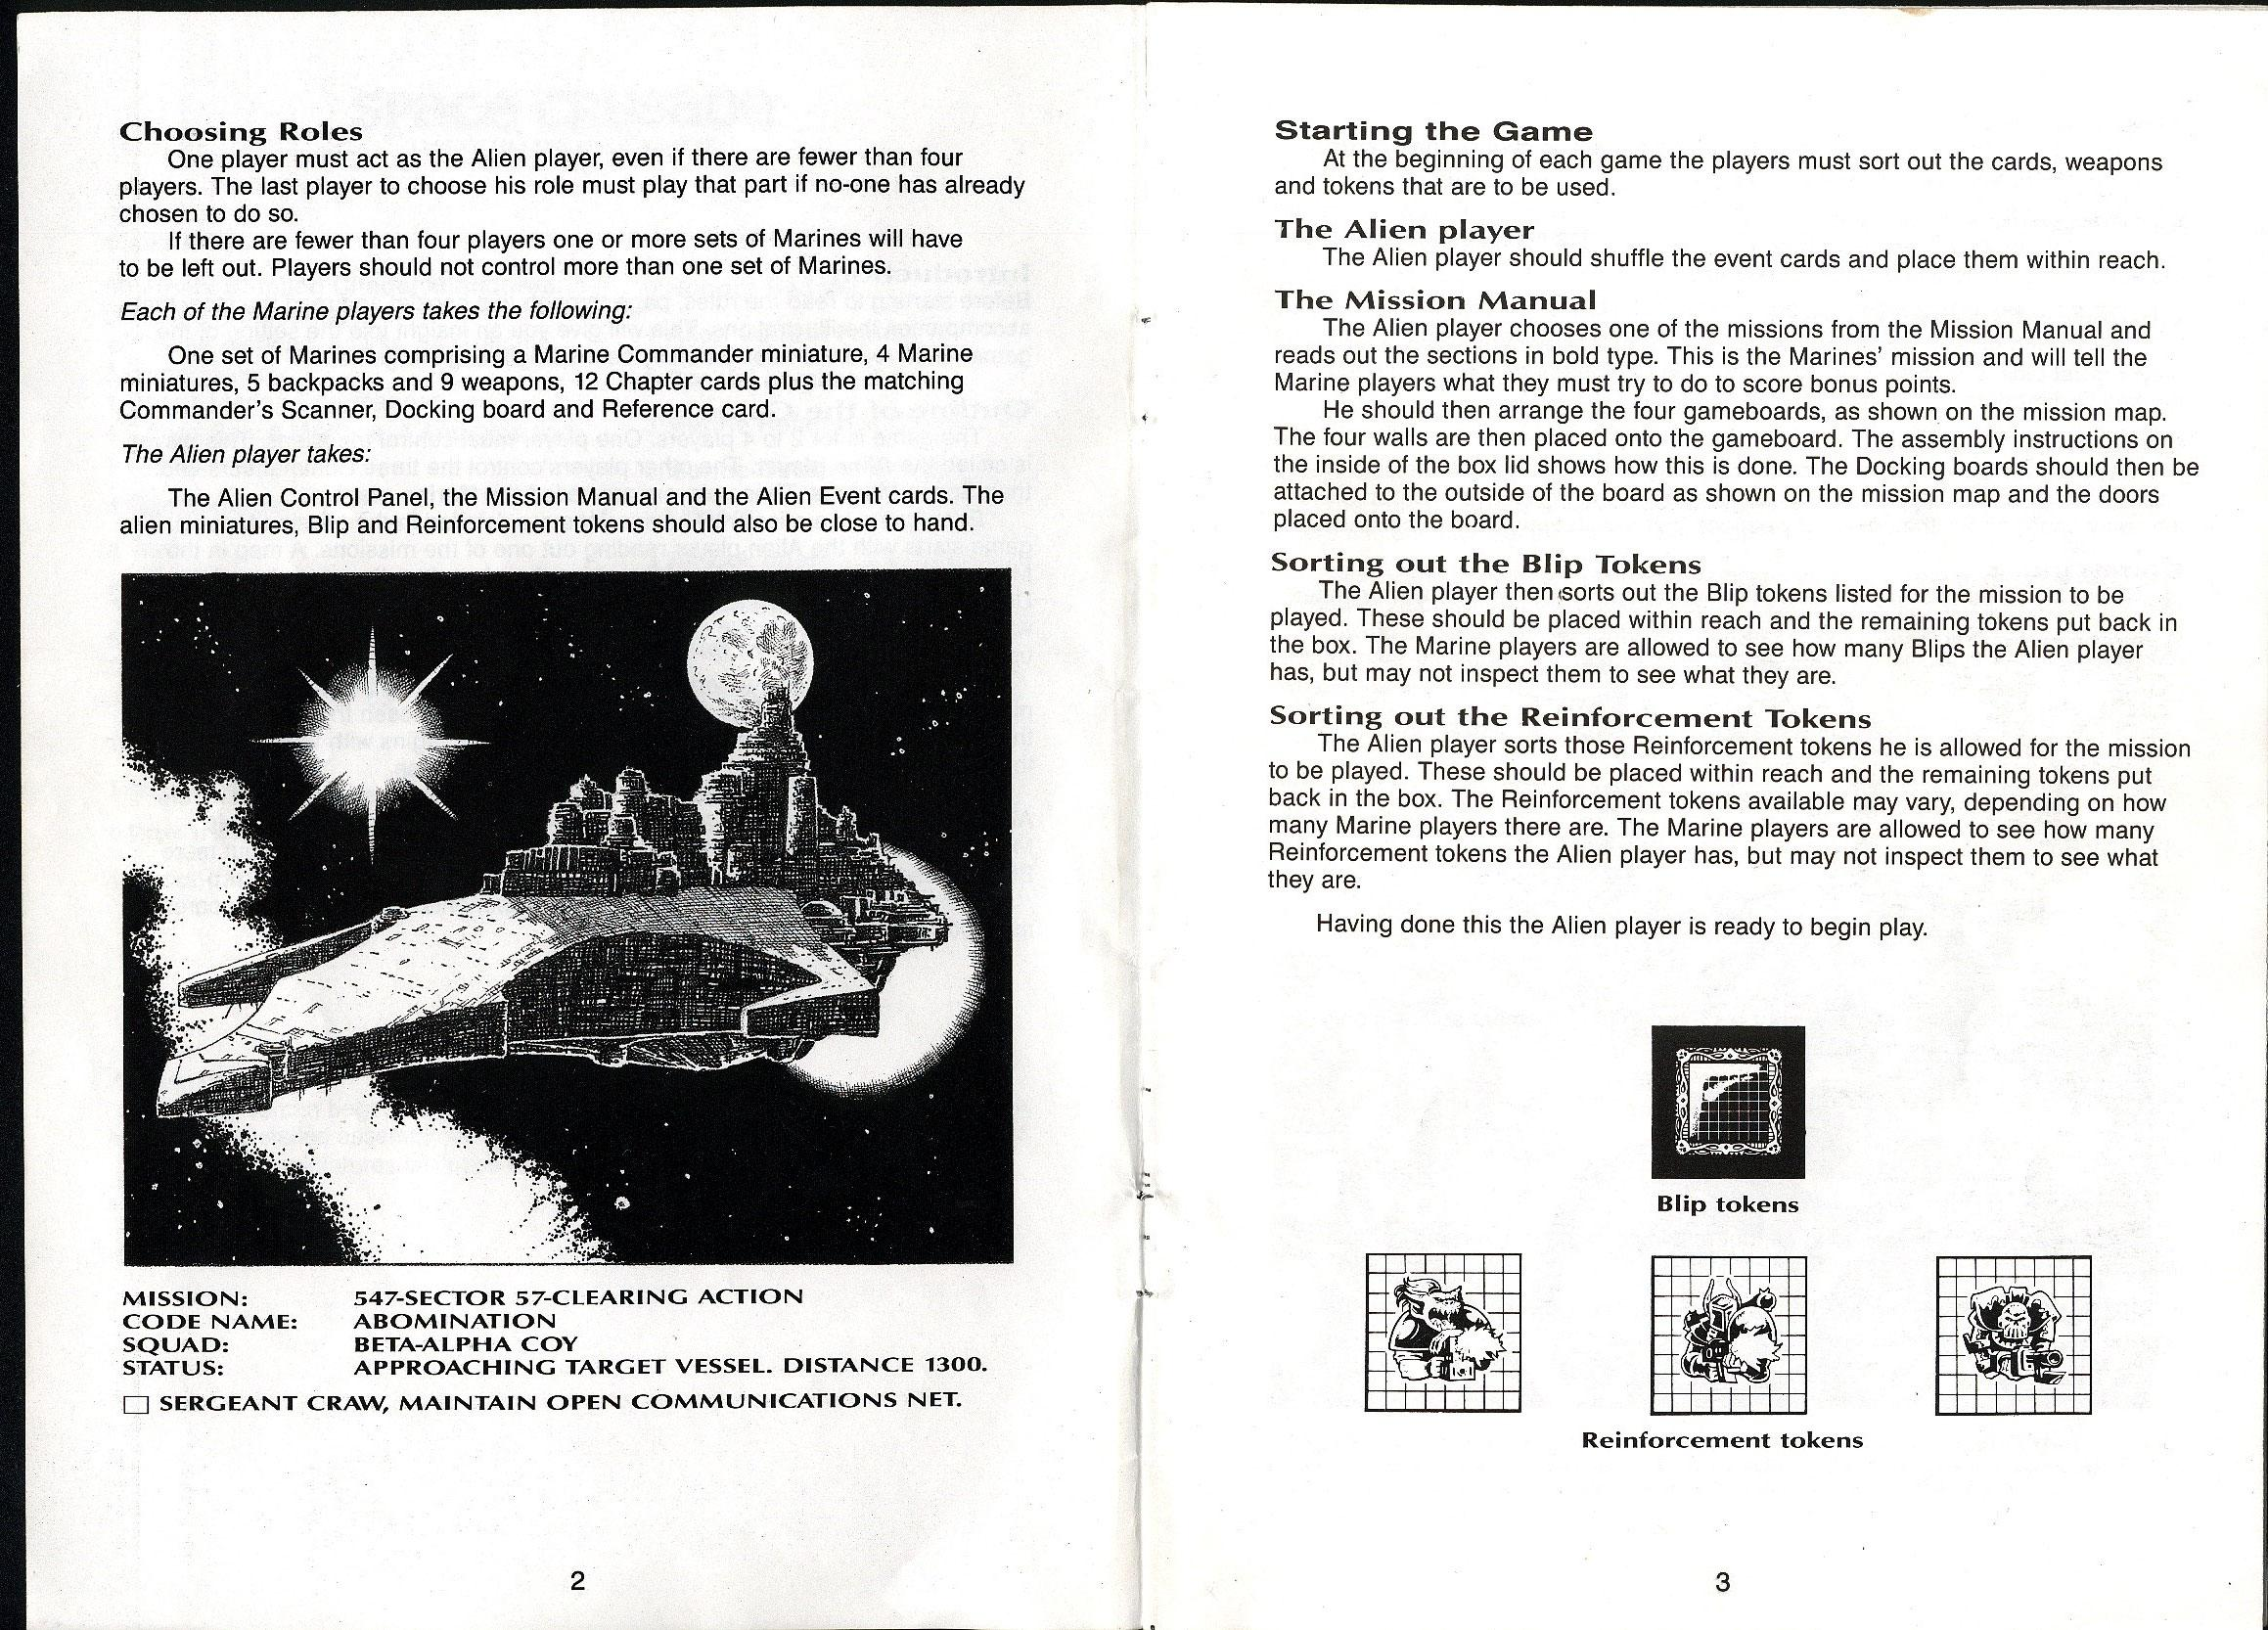 Space Crusade, space crusade rulebook page 1 and 2